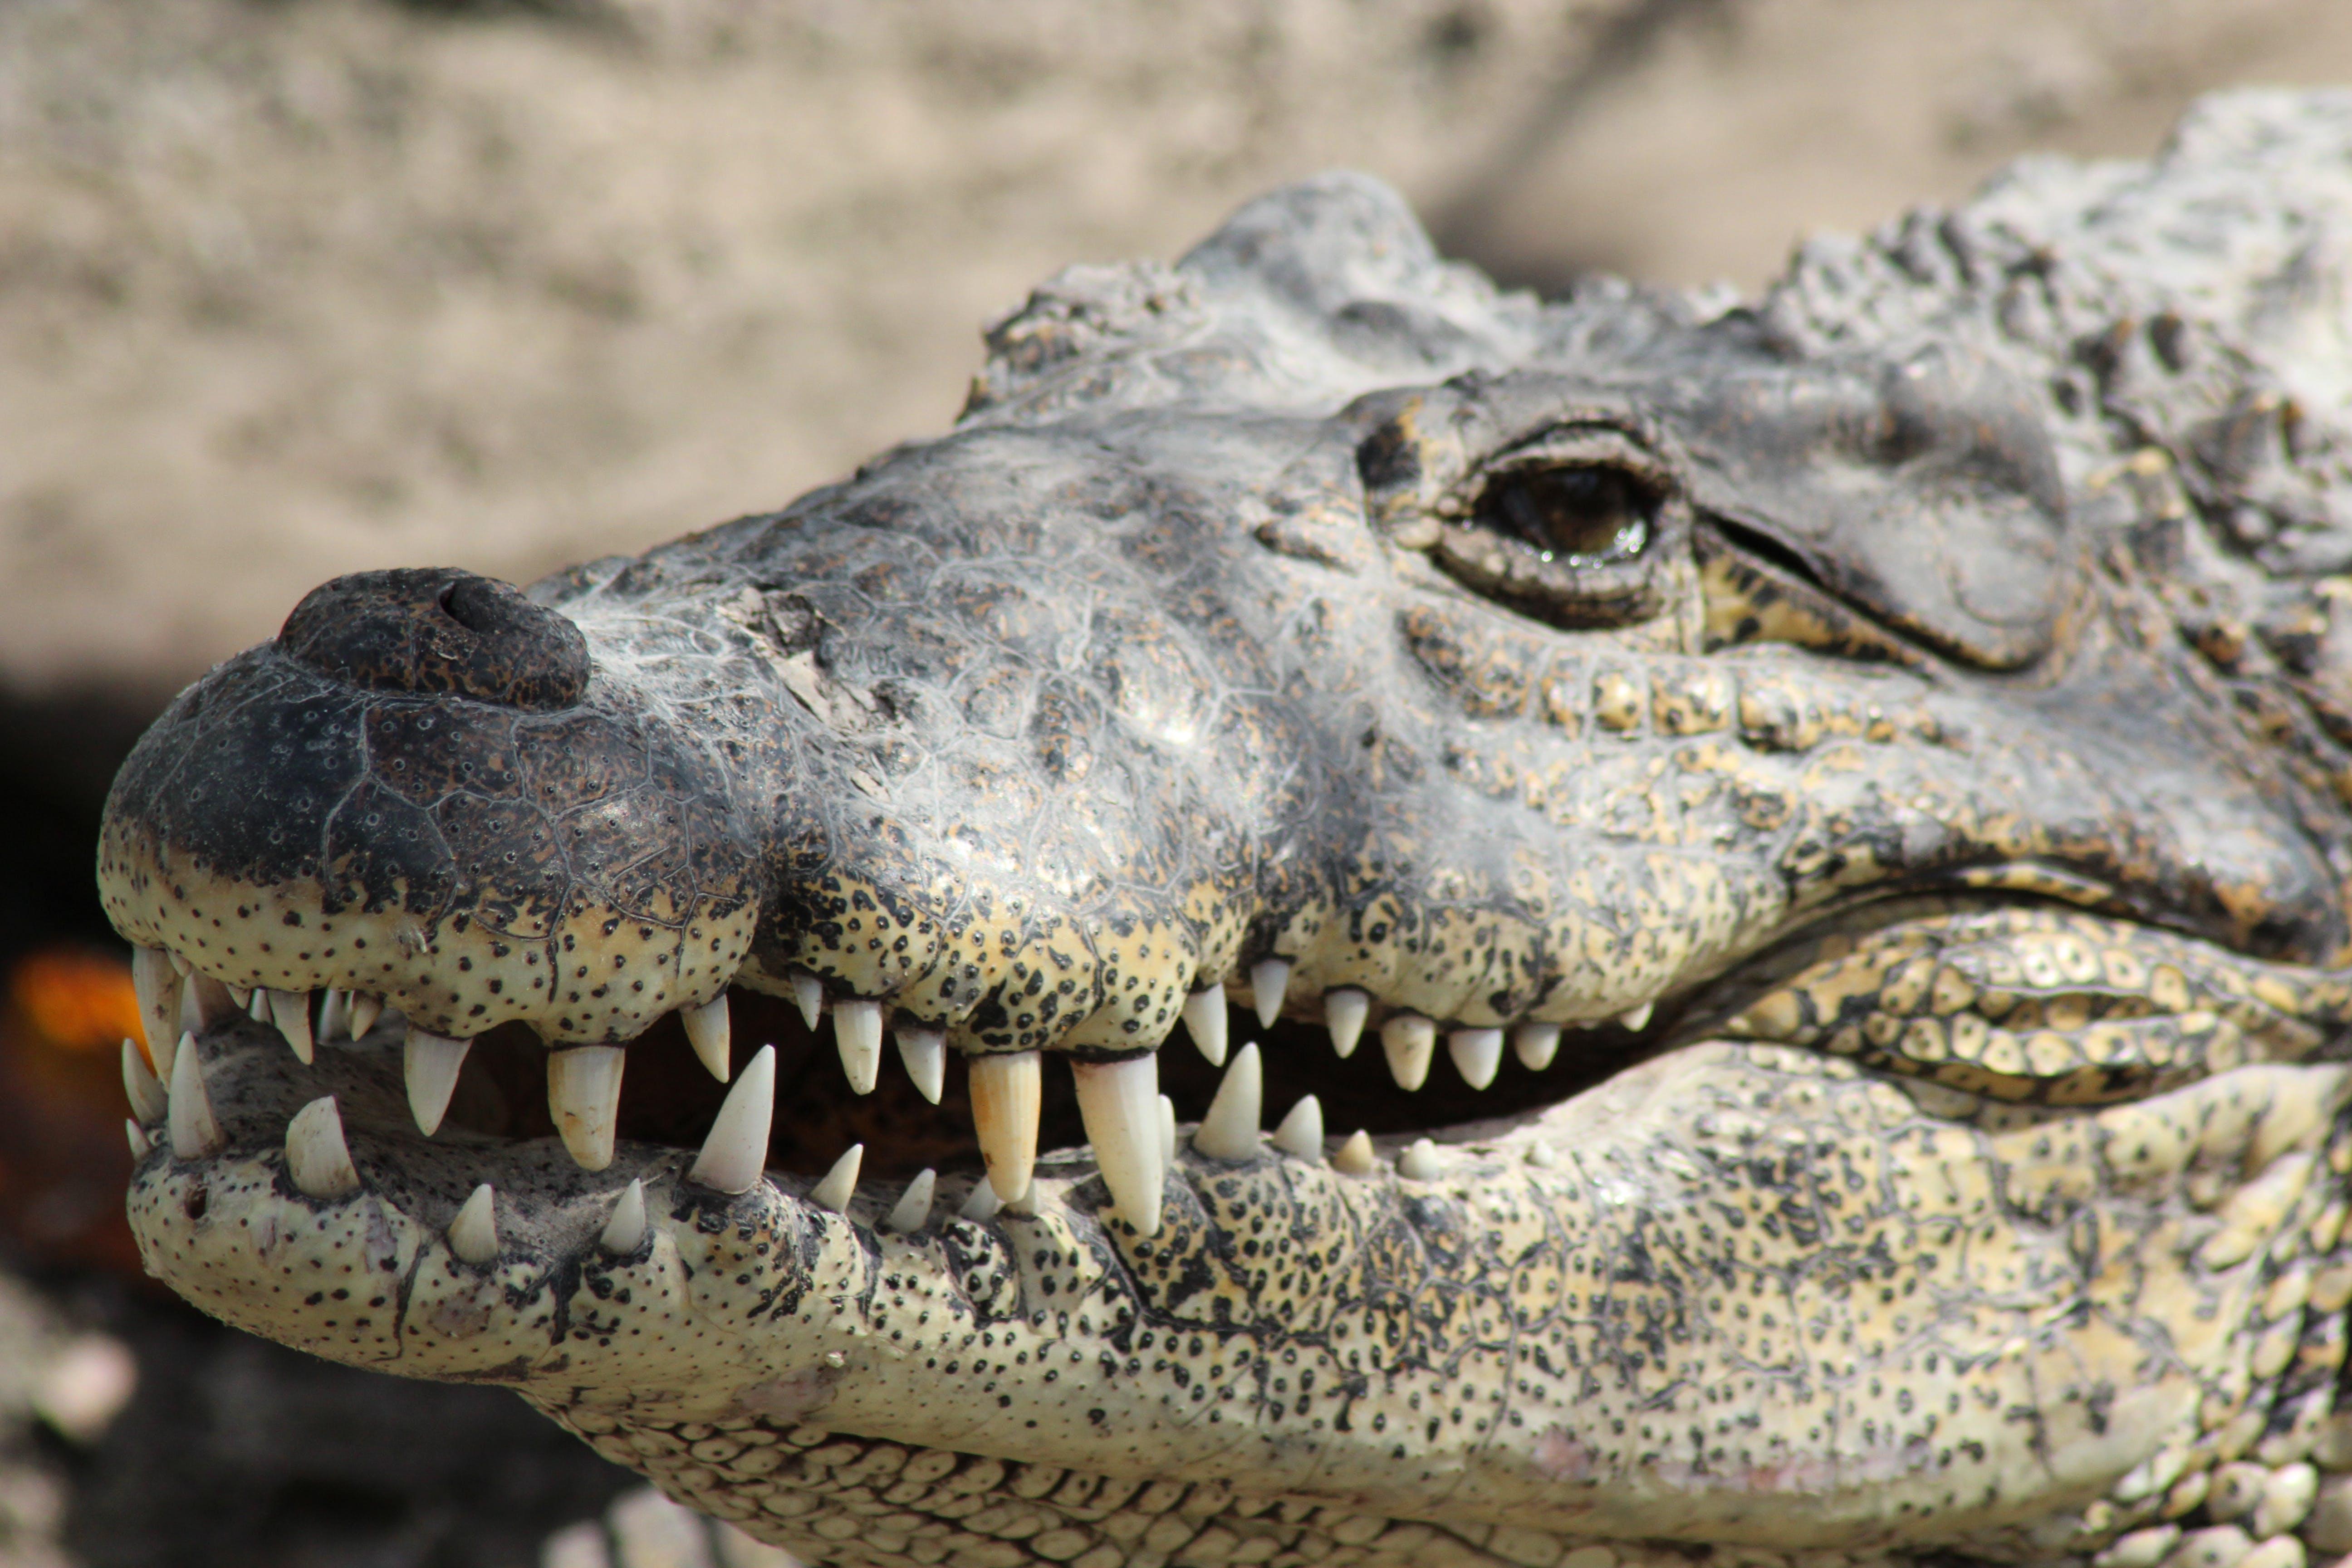 Free stock photo of alligator, animal, blurred background, close-up